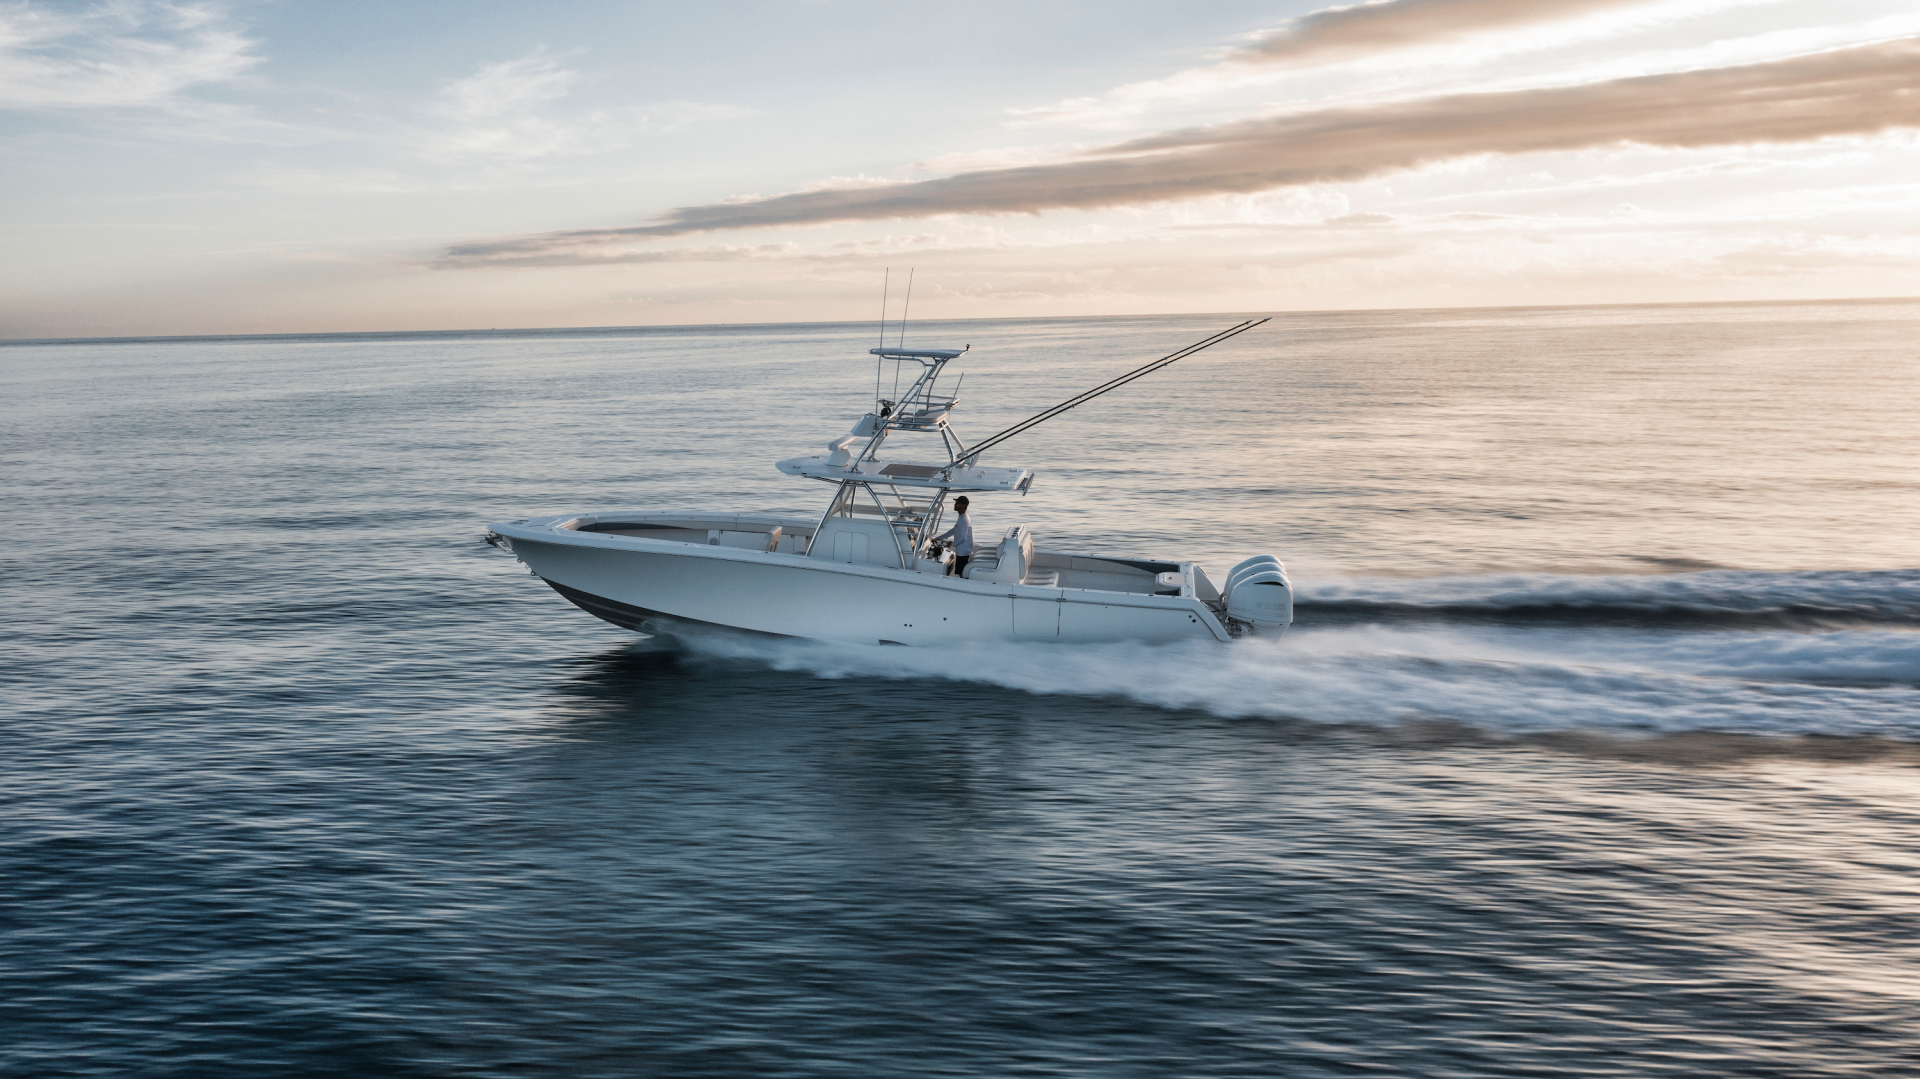 Invincible-Open Fisherman 2017-42 Invincible Jupiter-Florida-United States-1604170   Thumbnail